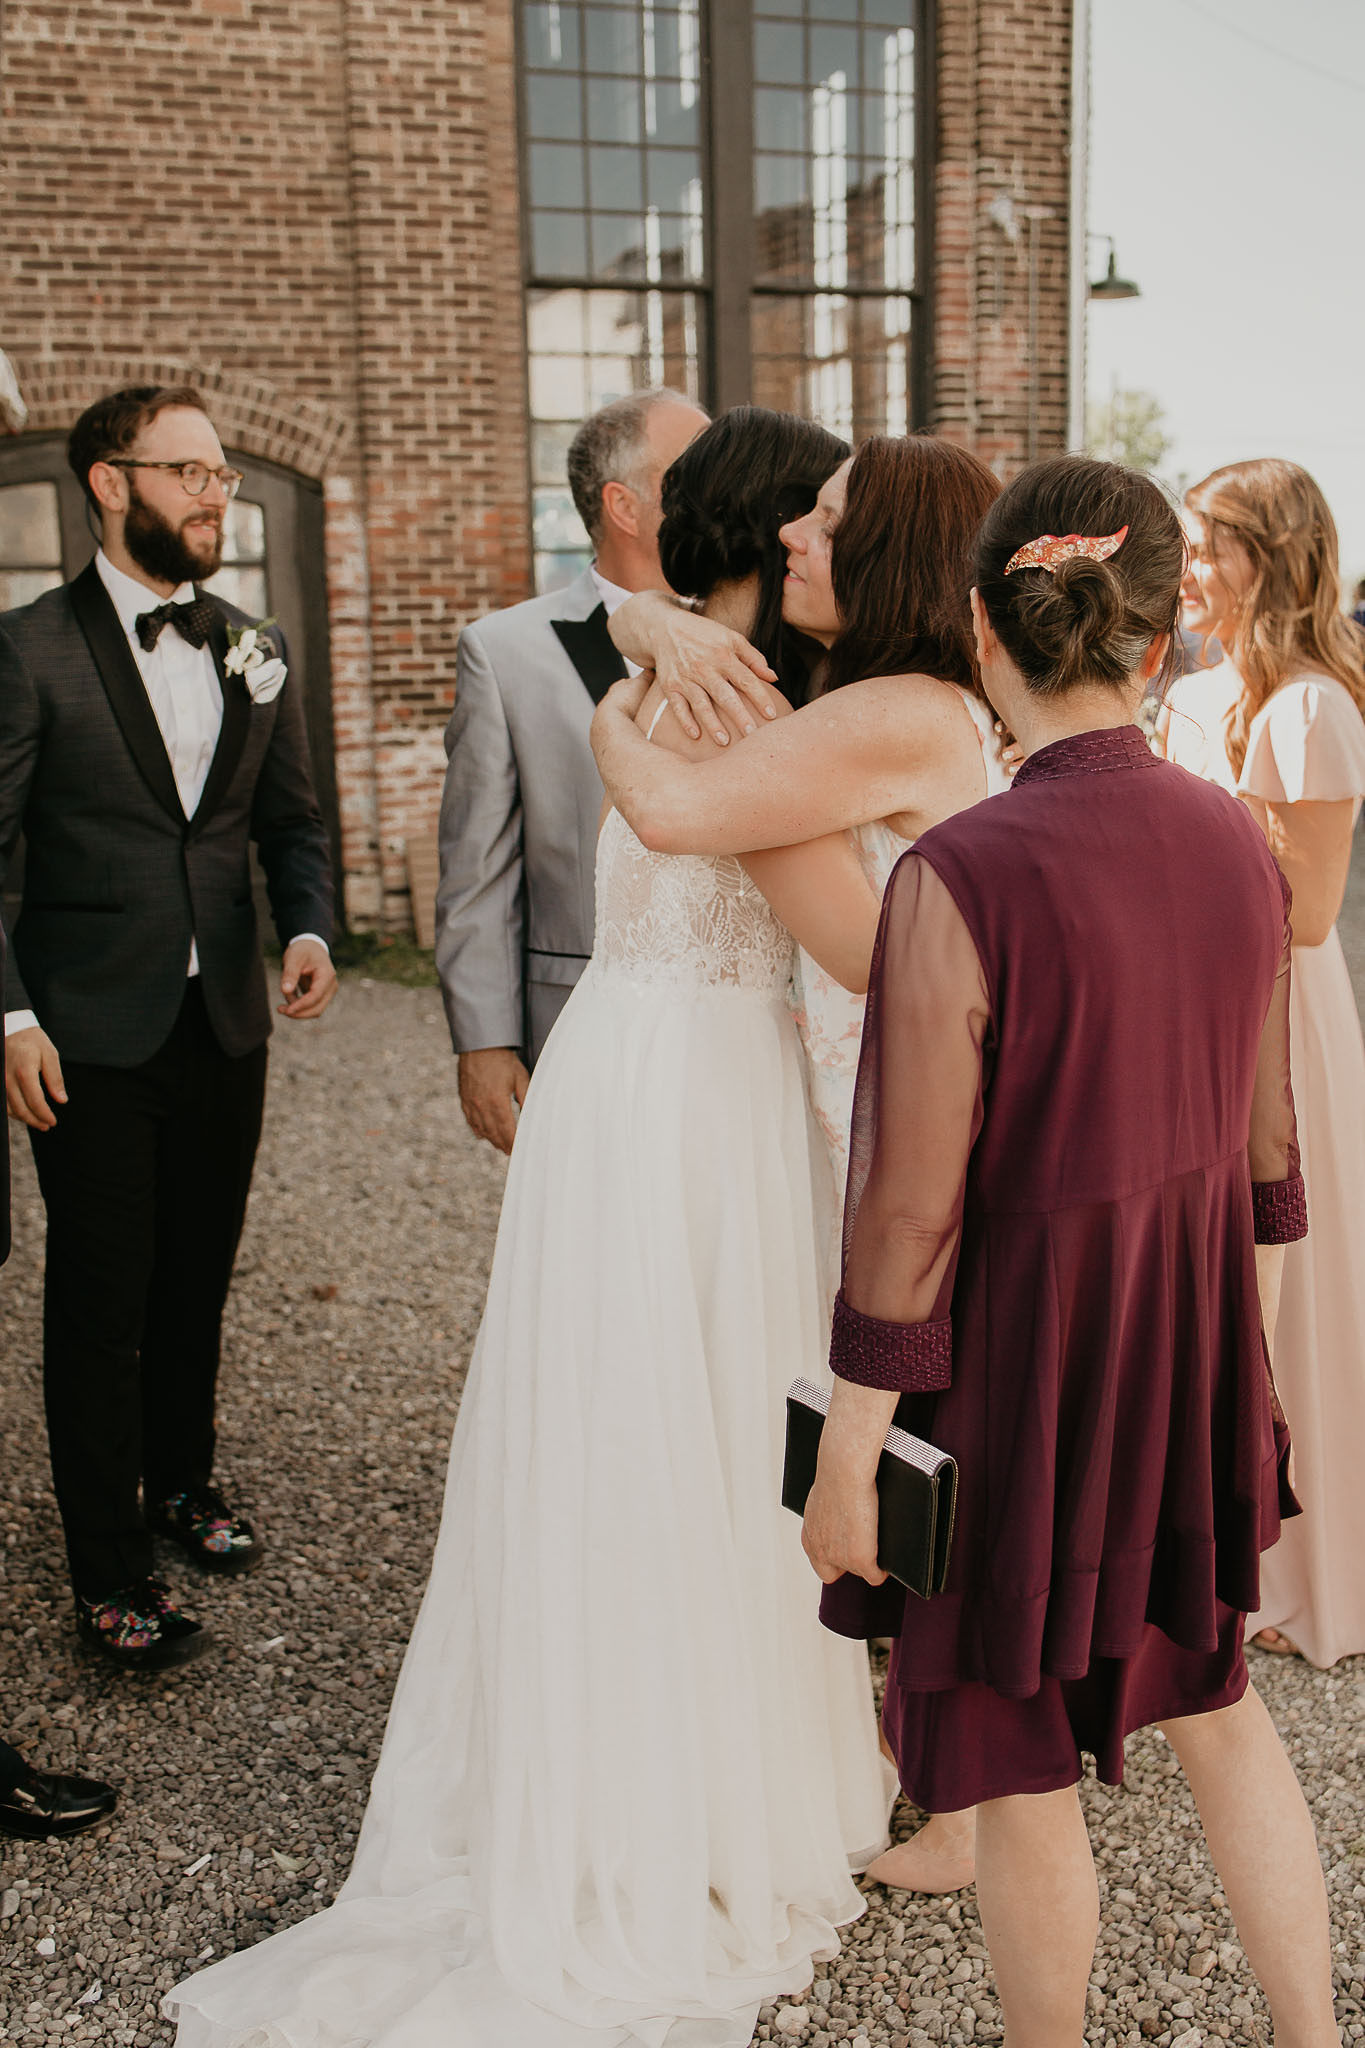 Jess+Matt_wedding-297.JPG